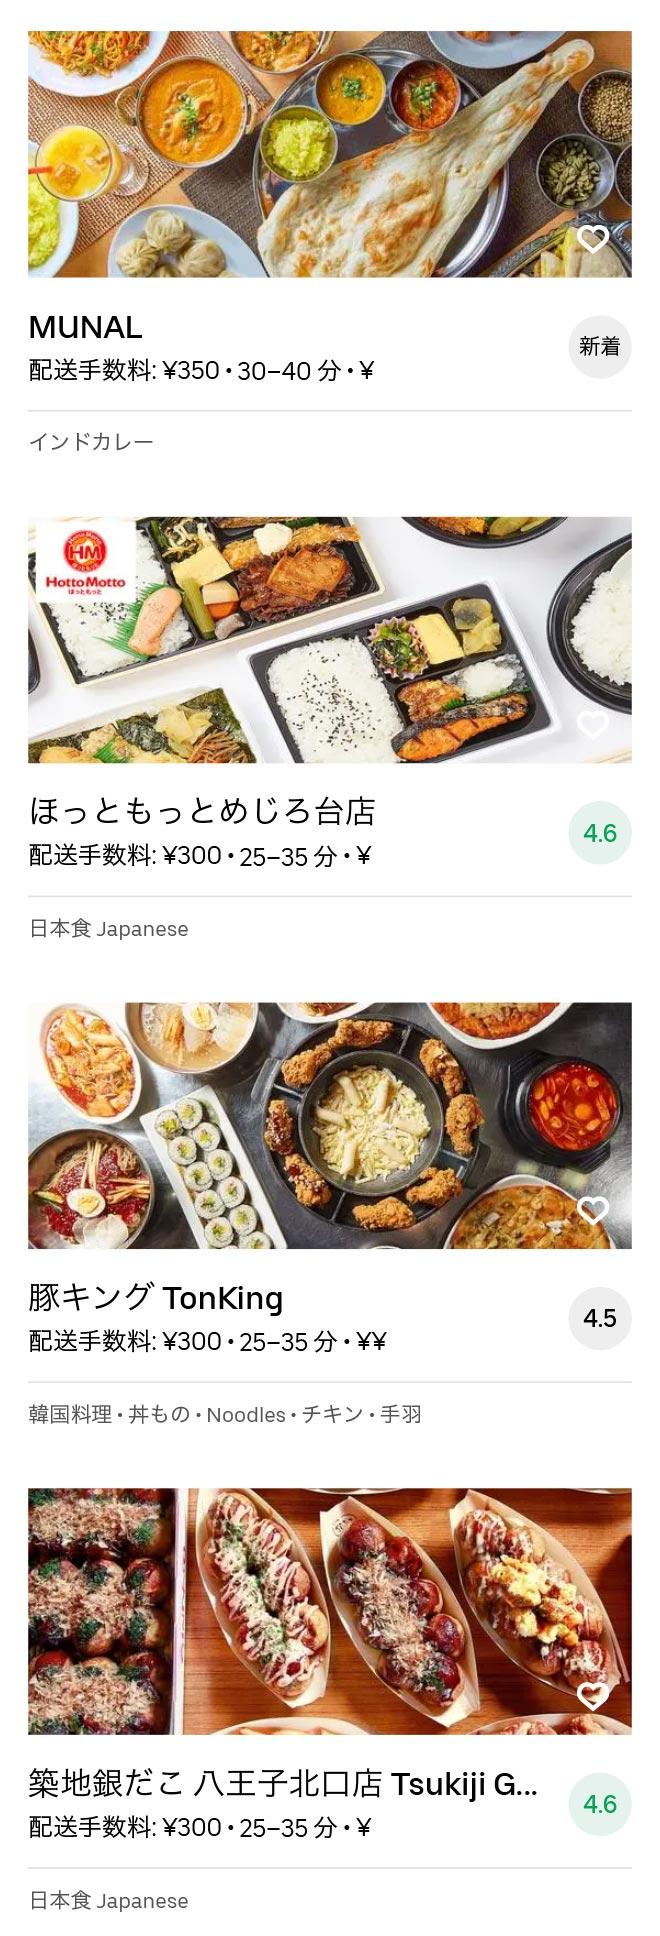 Nishi hatioji menu 2010 11